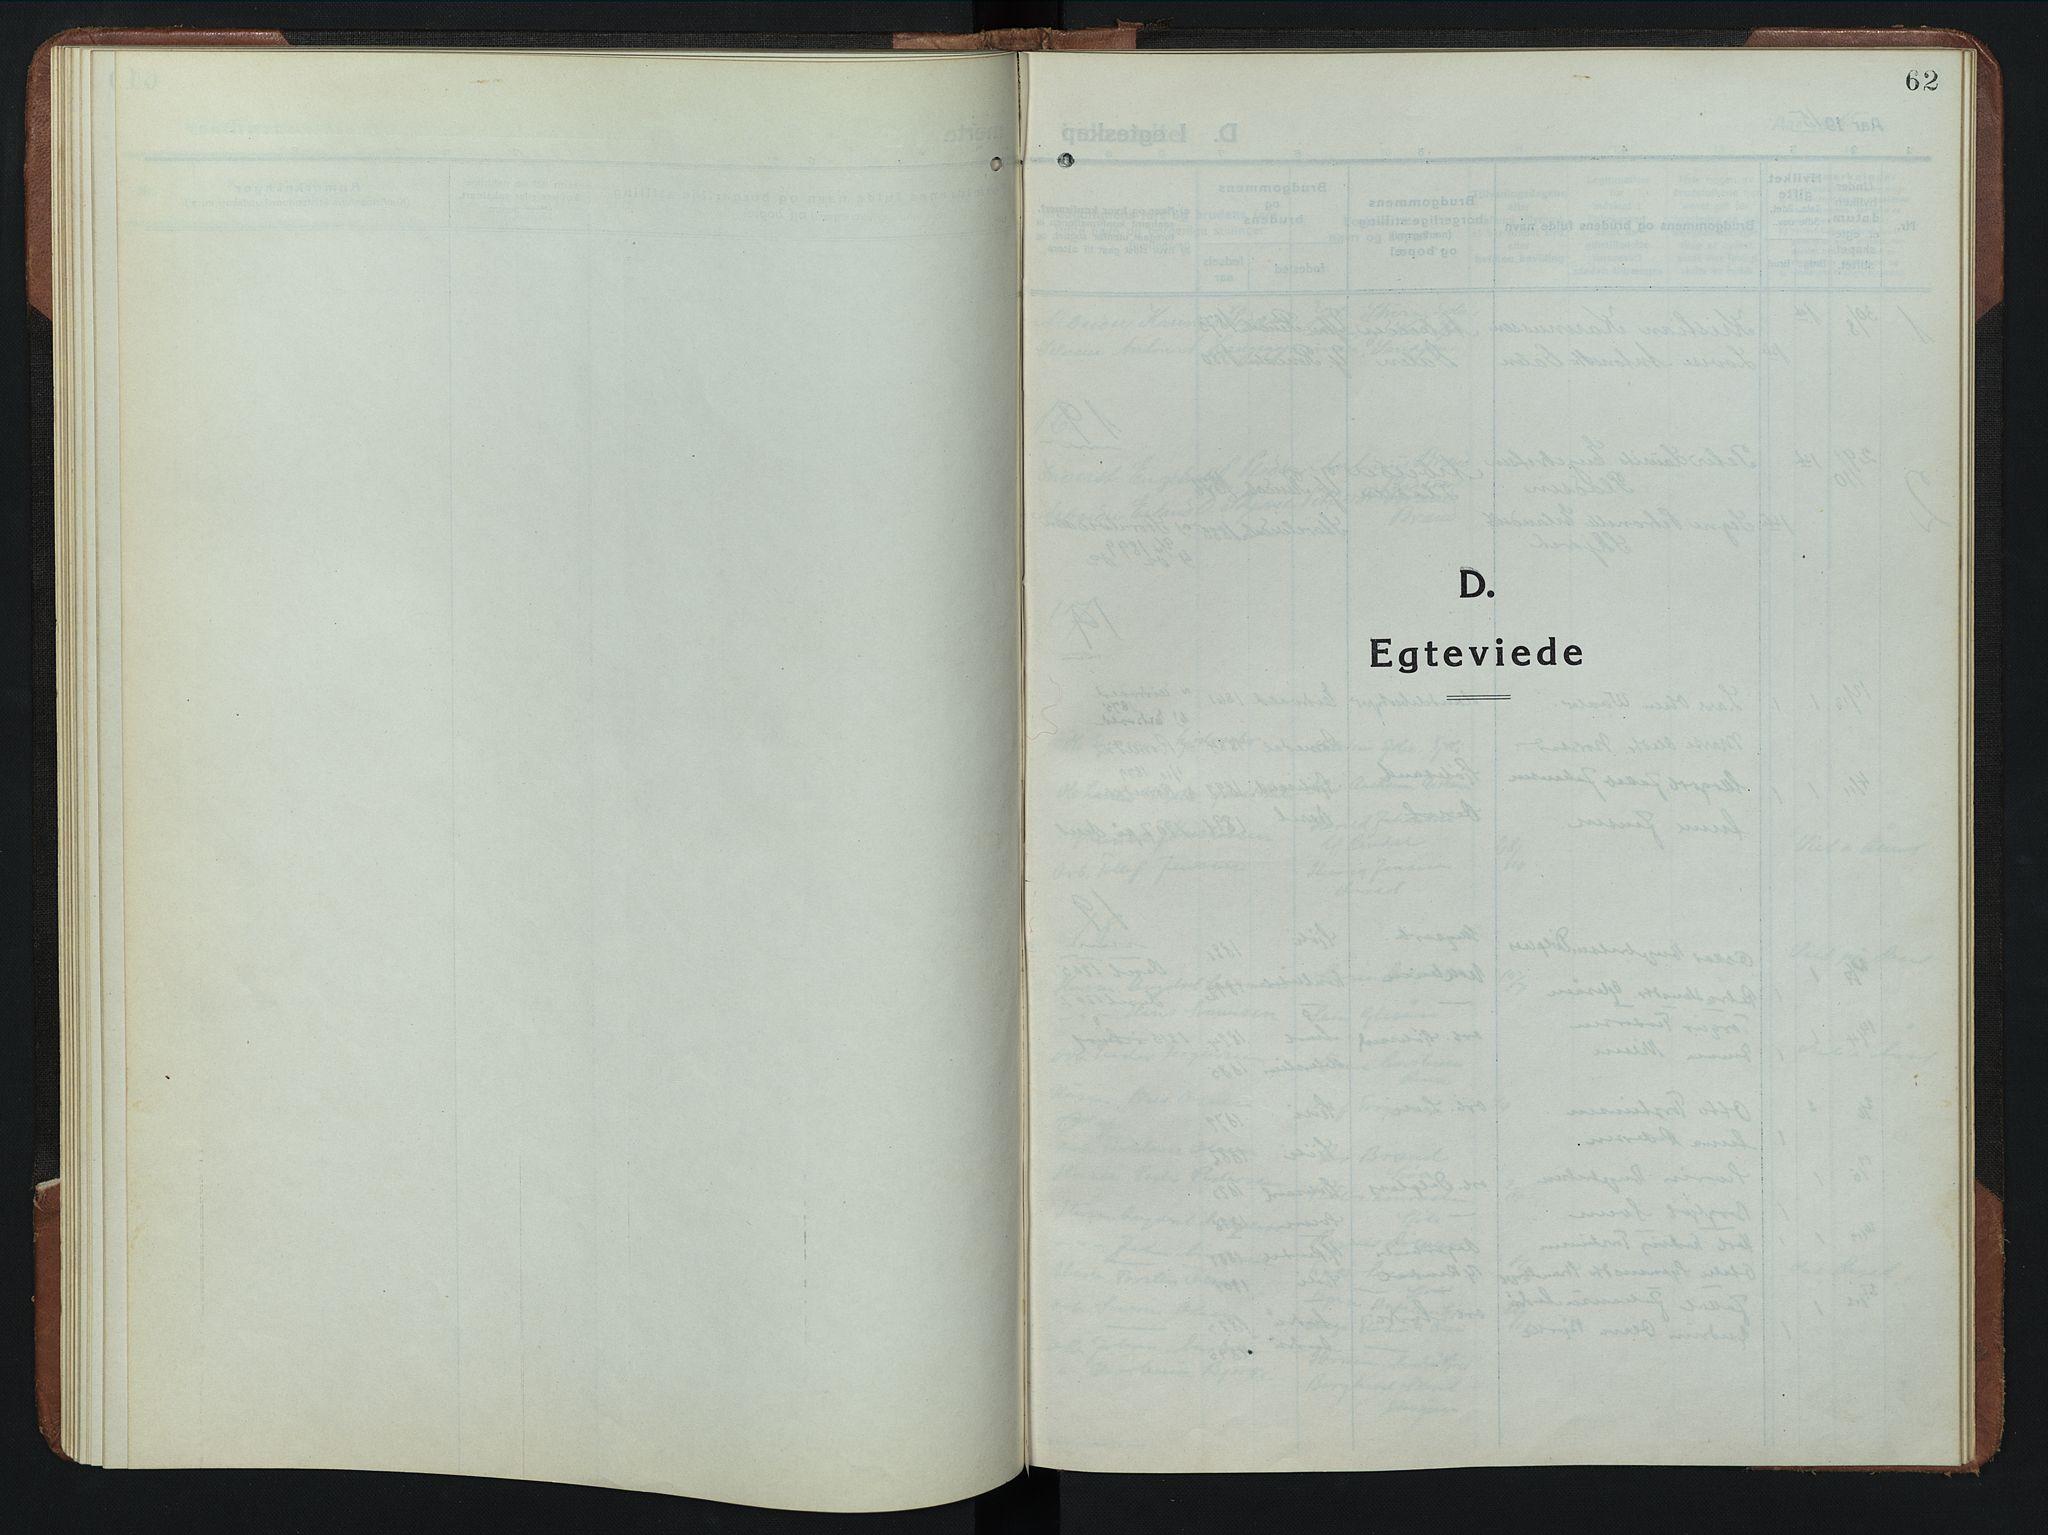 SAH, Rendalen prestekontor, H/Ha/Hab/L0008: Parish register (copy) no. 8, 1914-1948, p. 62